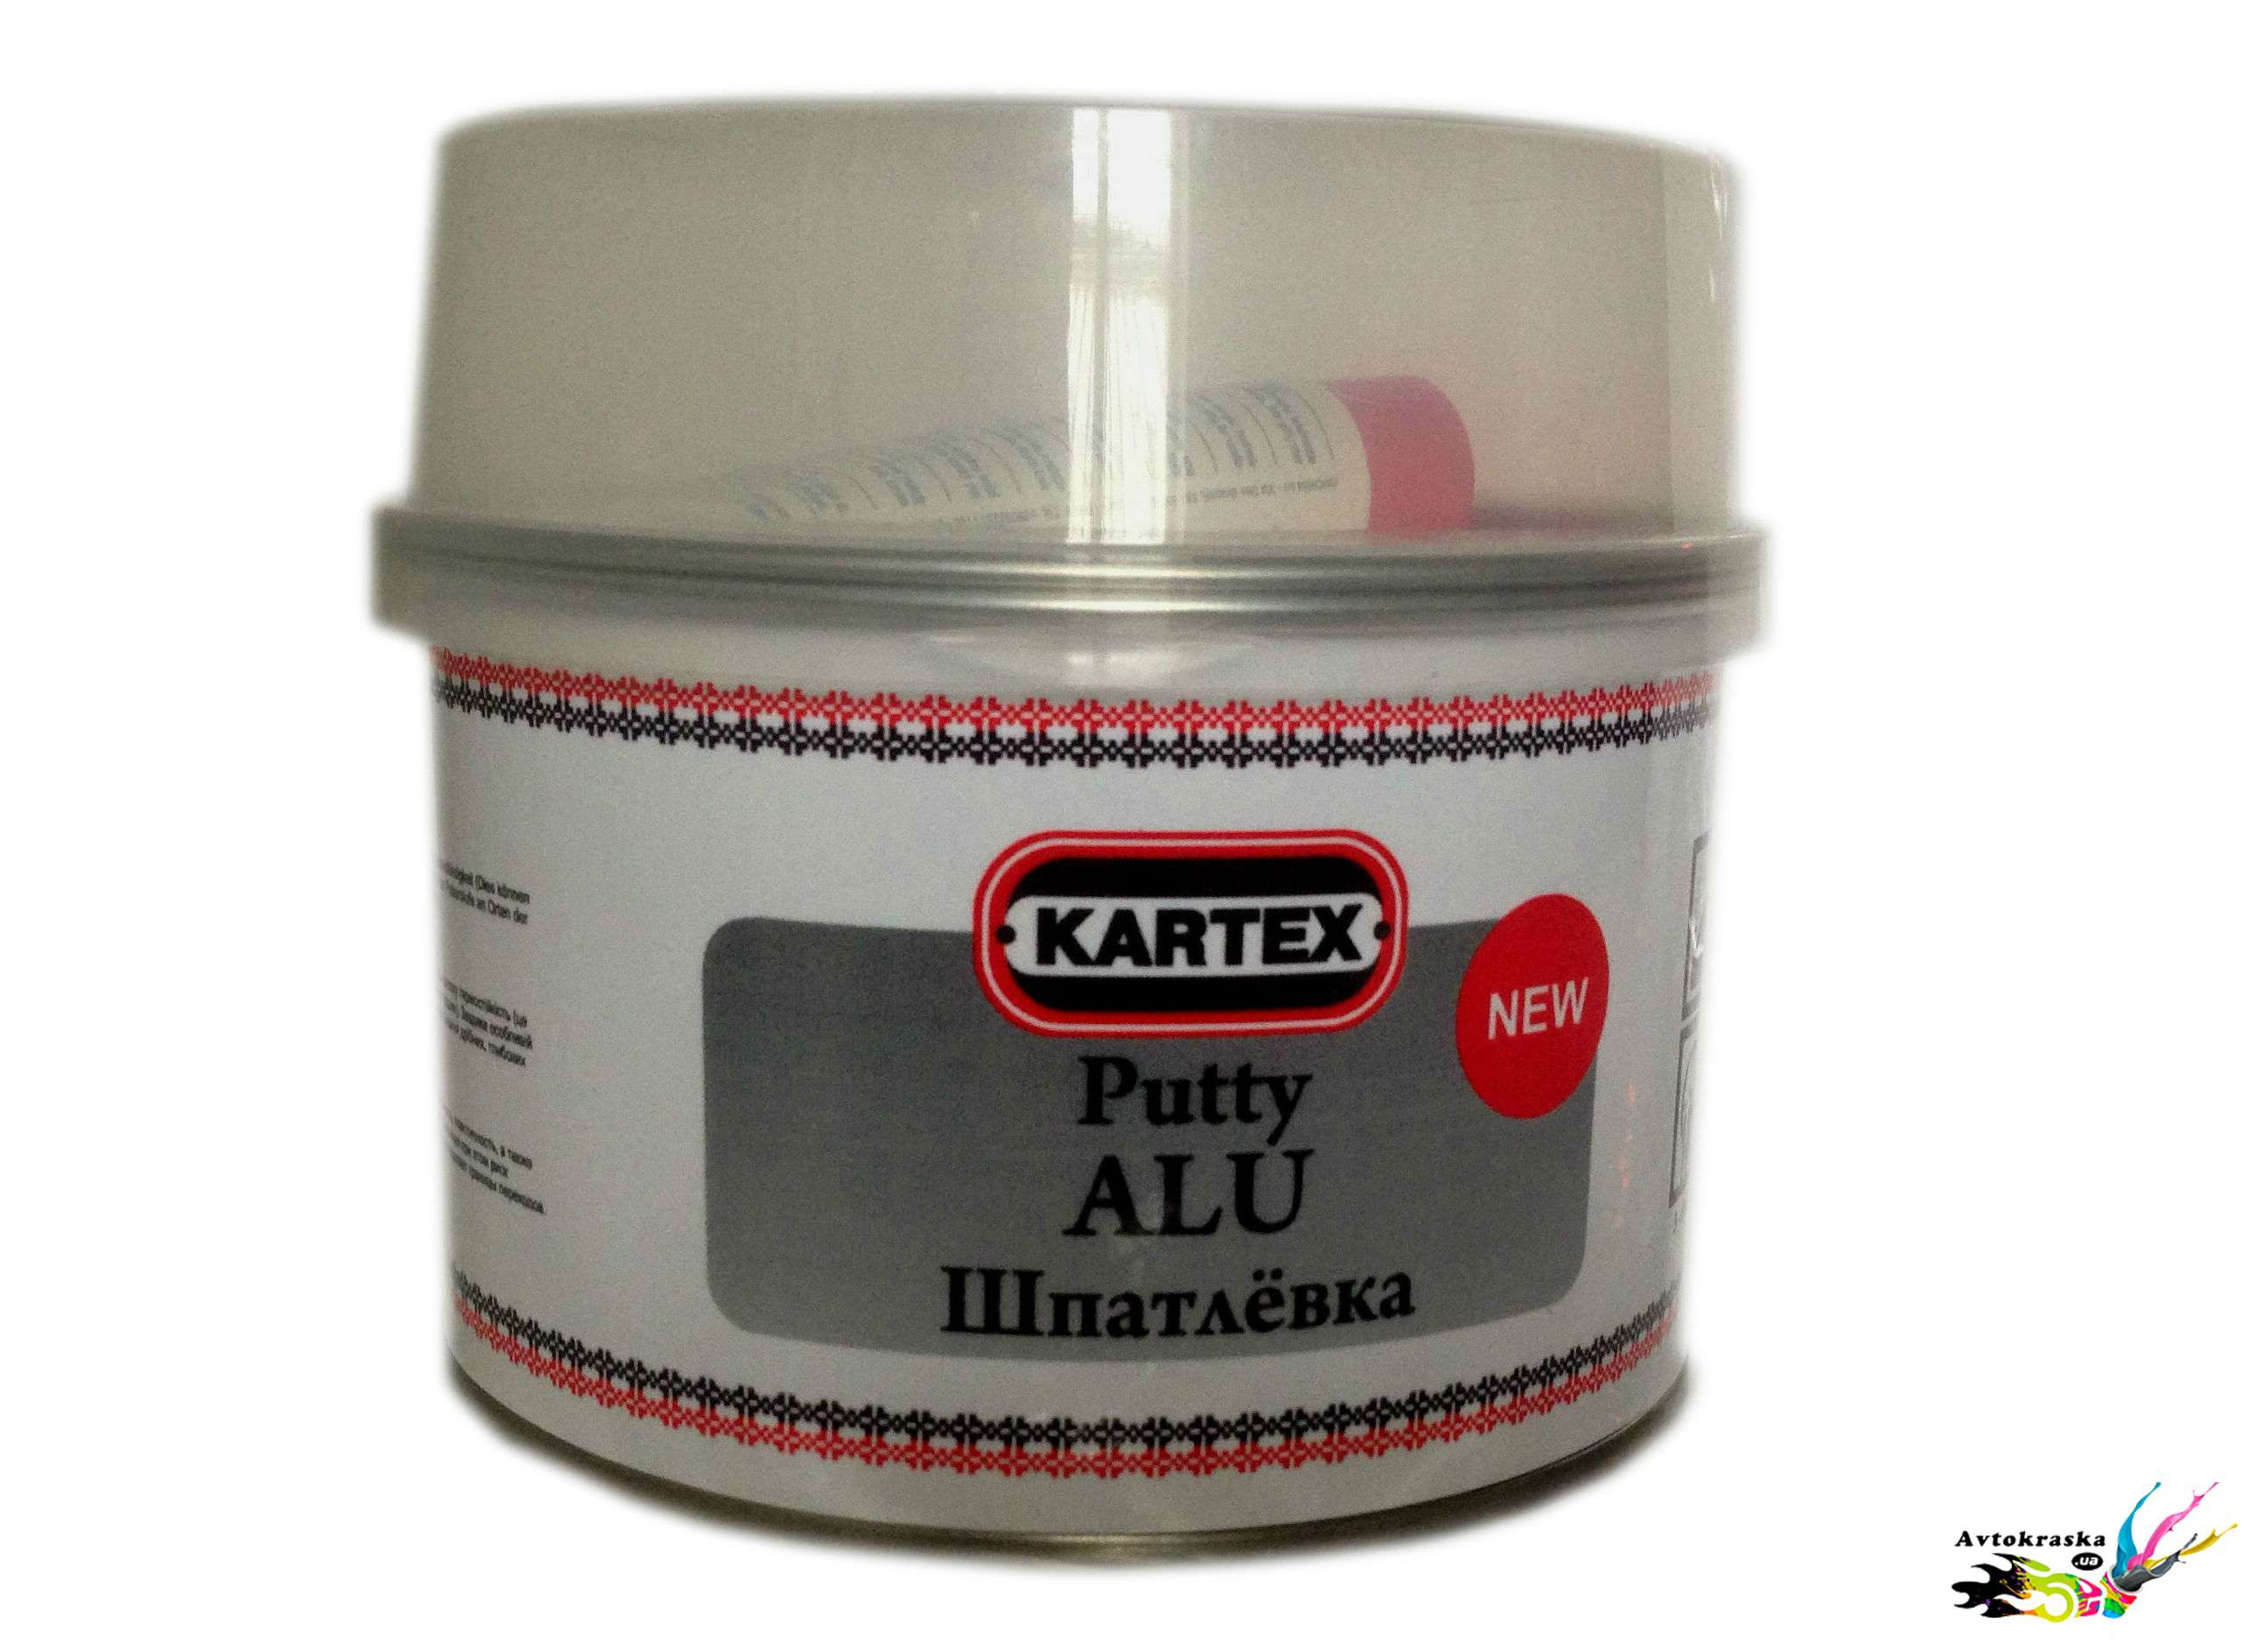 Шпатлевка с алюминием Kartex 11620 0,5 кг